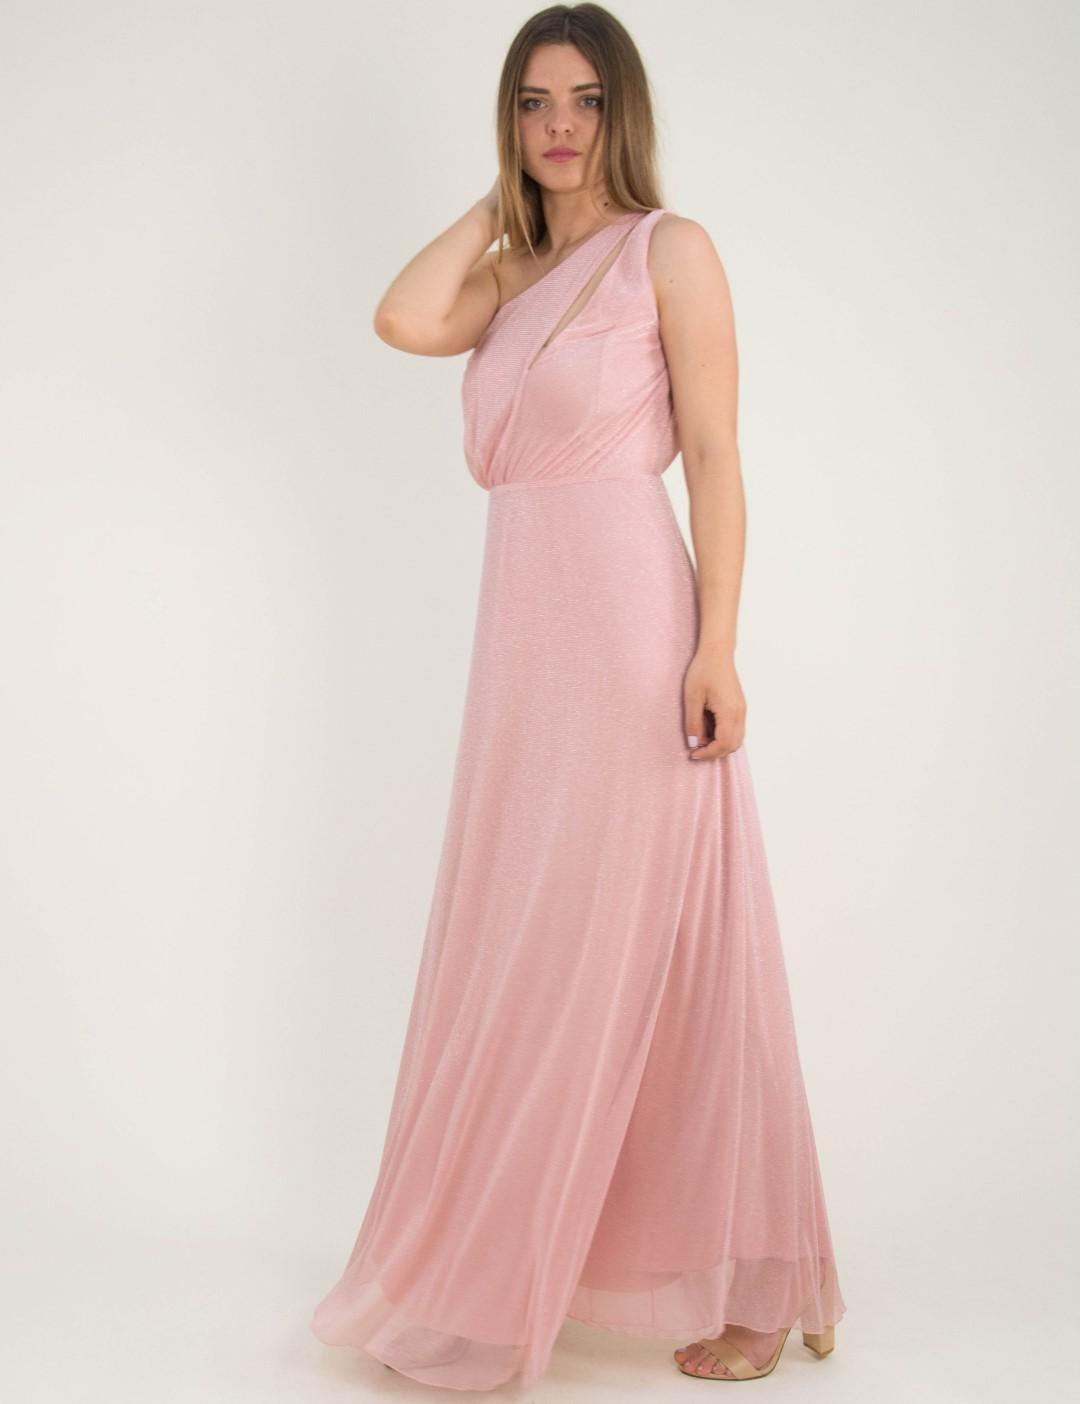 830f91c2cdcd Γυναικείο ροζ maxi φόρεμα Lurex τούλι No Stress 8575288L